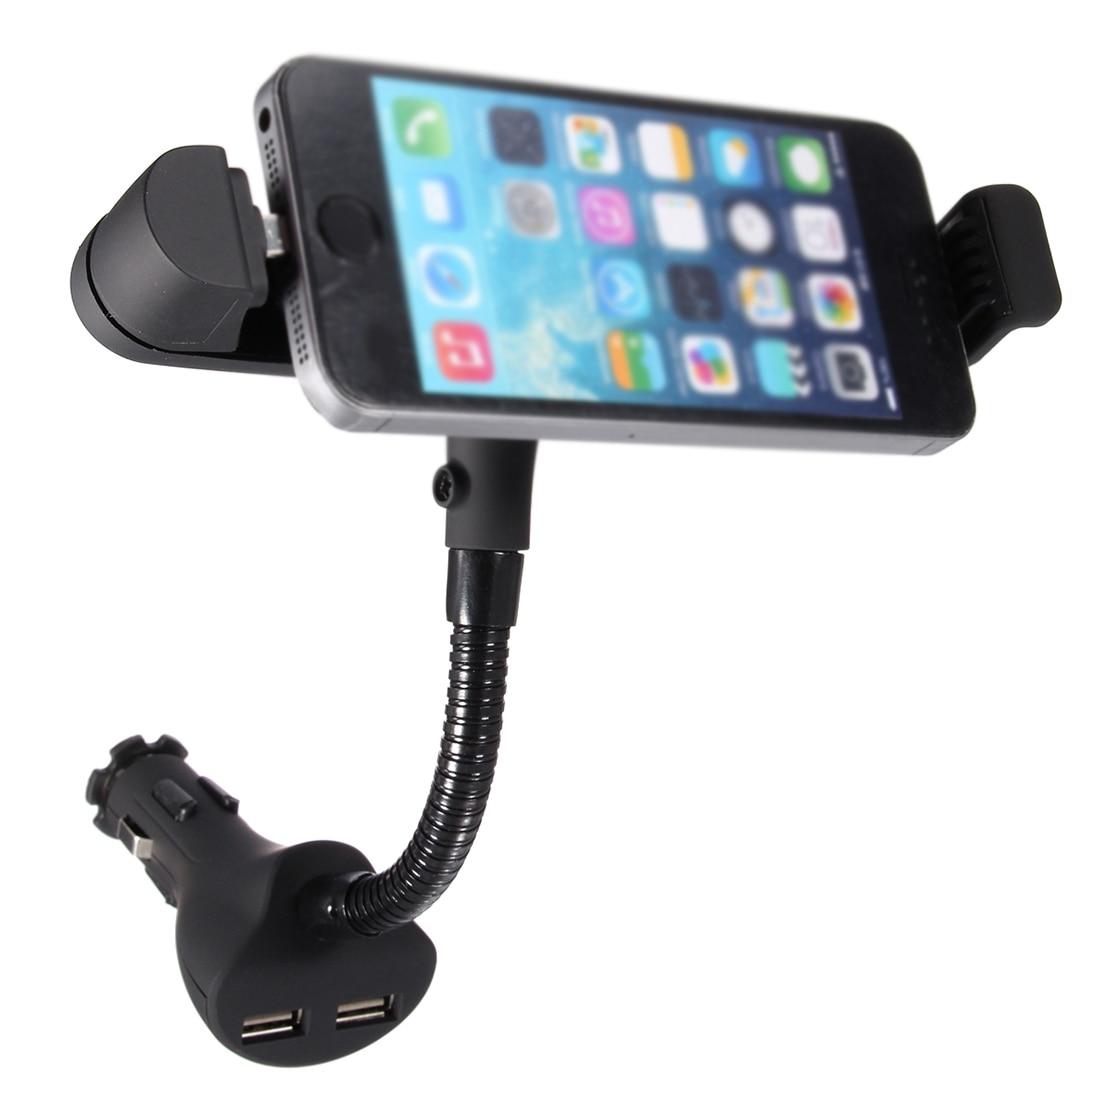 Dual USB Car Charger Cigarette Lighter Mount Holder for iPhone 6S Plus 6 5S 5C 5 Black